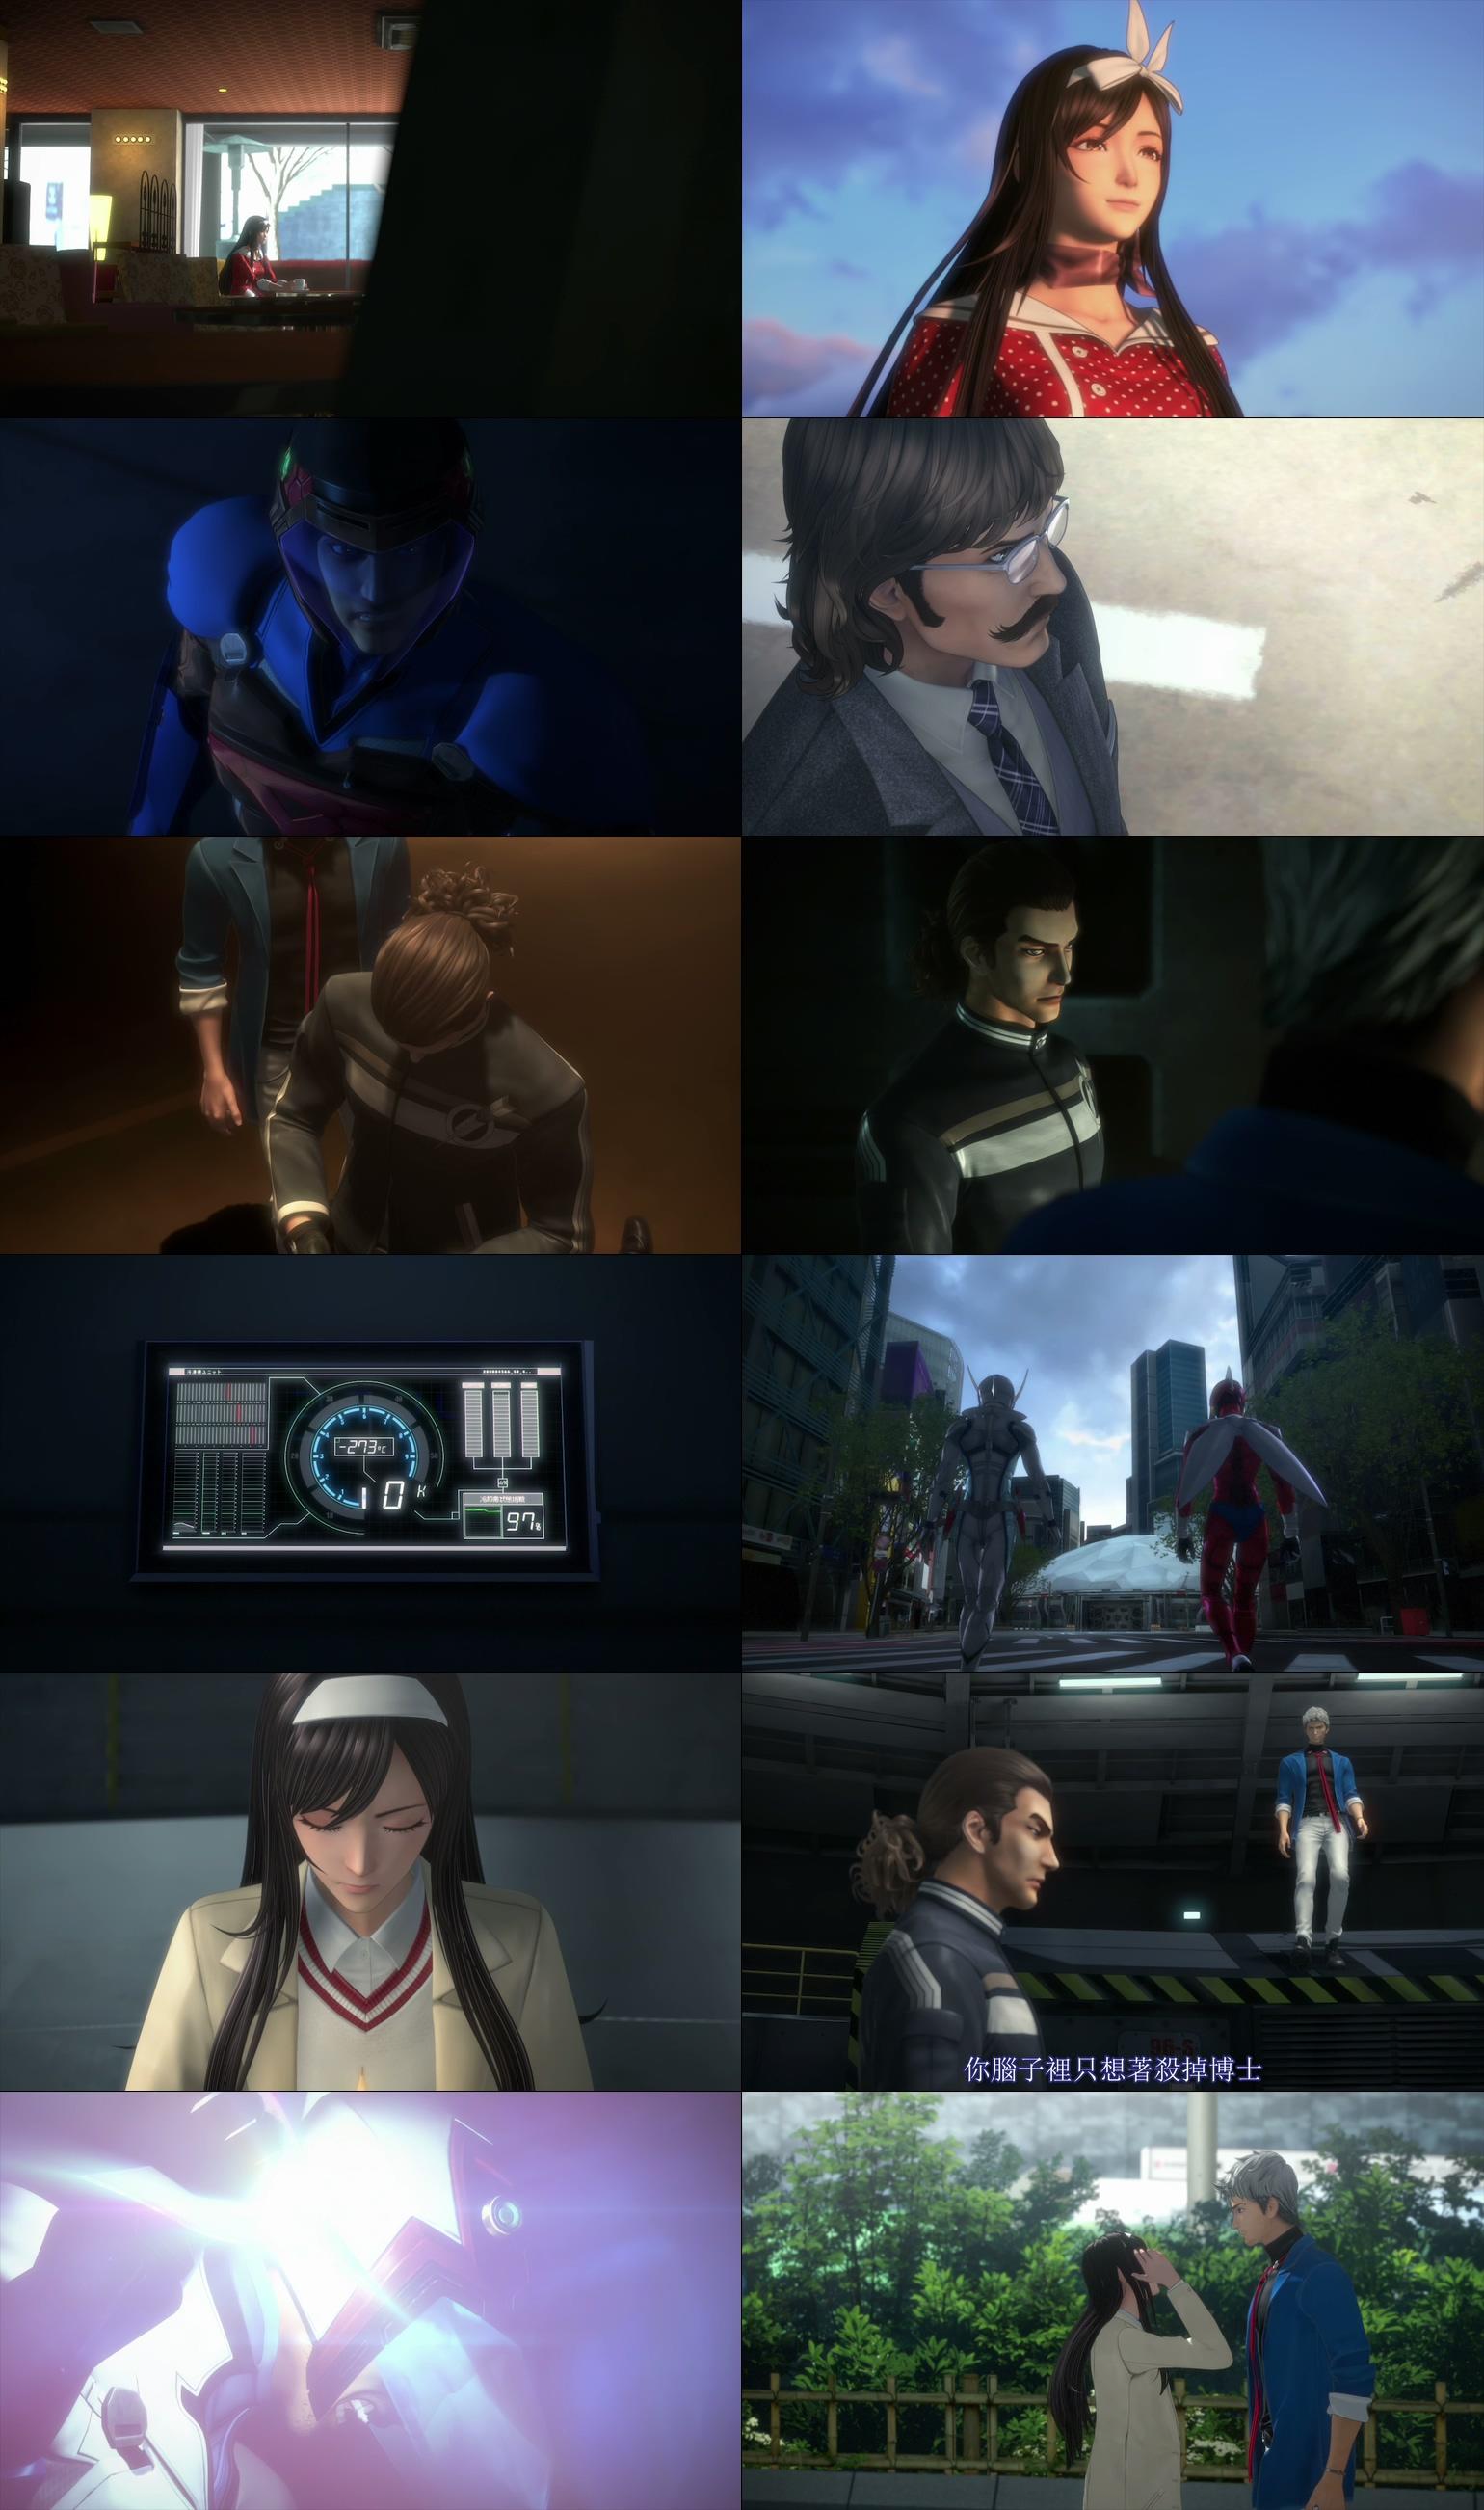 Gekijouban.Infini.T.Force.Gatchaman.Saraba.Tomoyo.2018.1080p.BDRip.X264.AC3-FEWAT